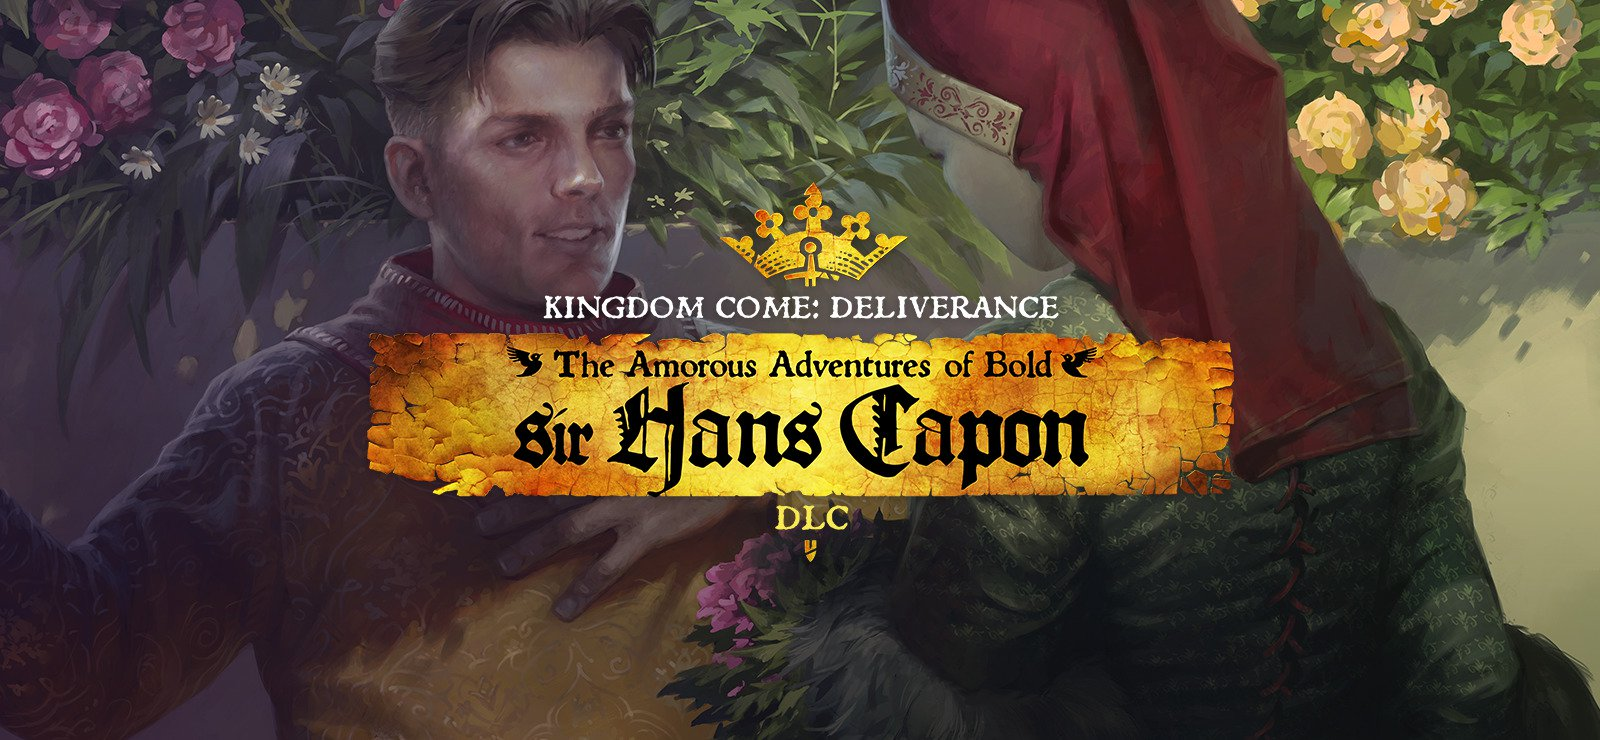 Kingdom-Come-Deliverance-DLC-The-Amorous-Adventures-of-bold-Sir-Hans-Capon